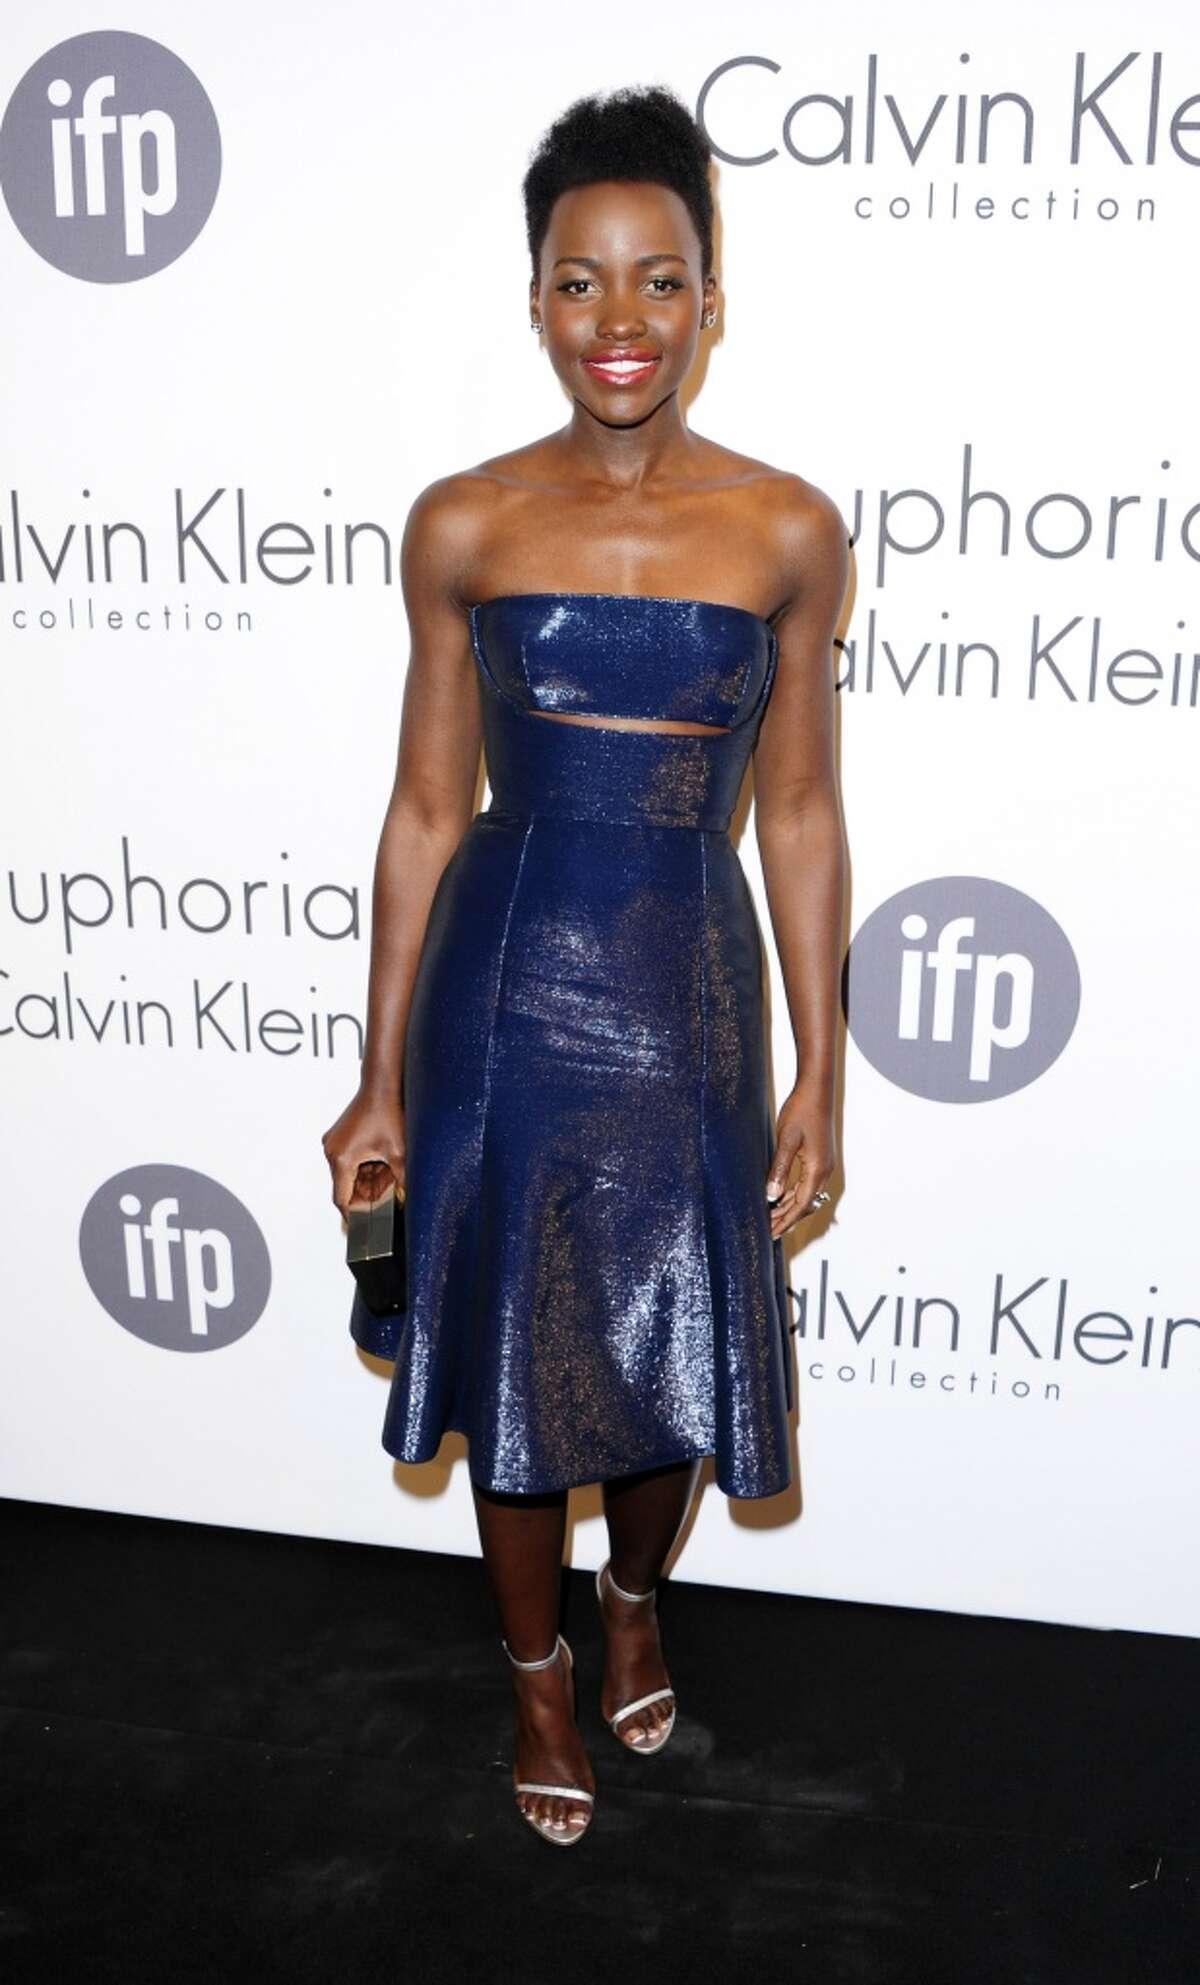 Lupita Nyong'o, an Oscar winner for